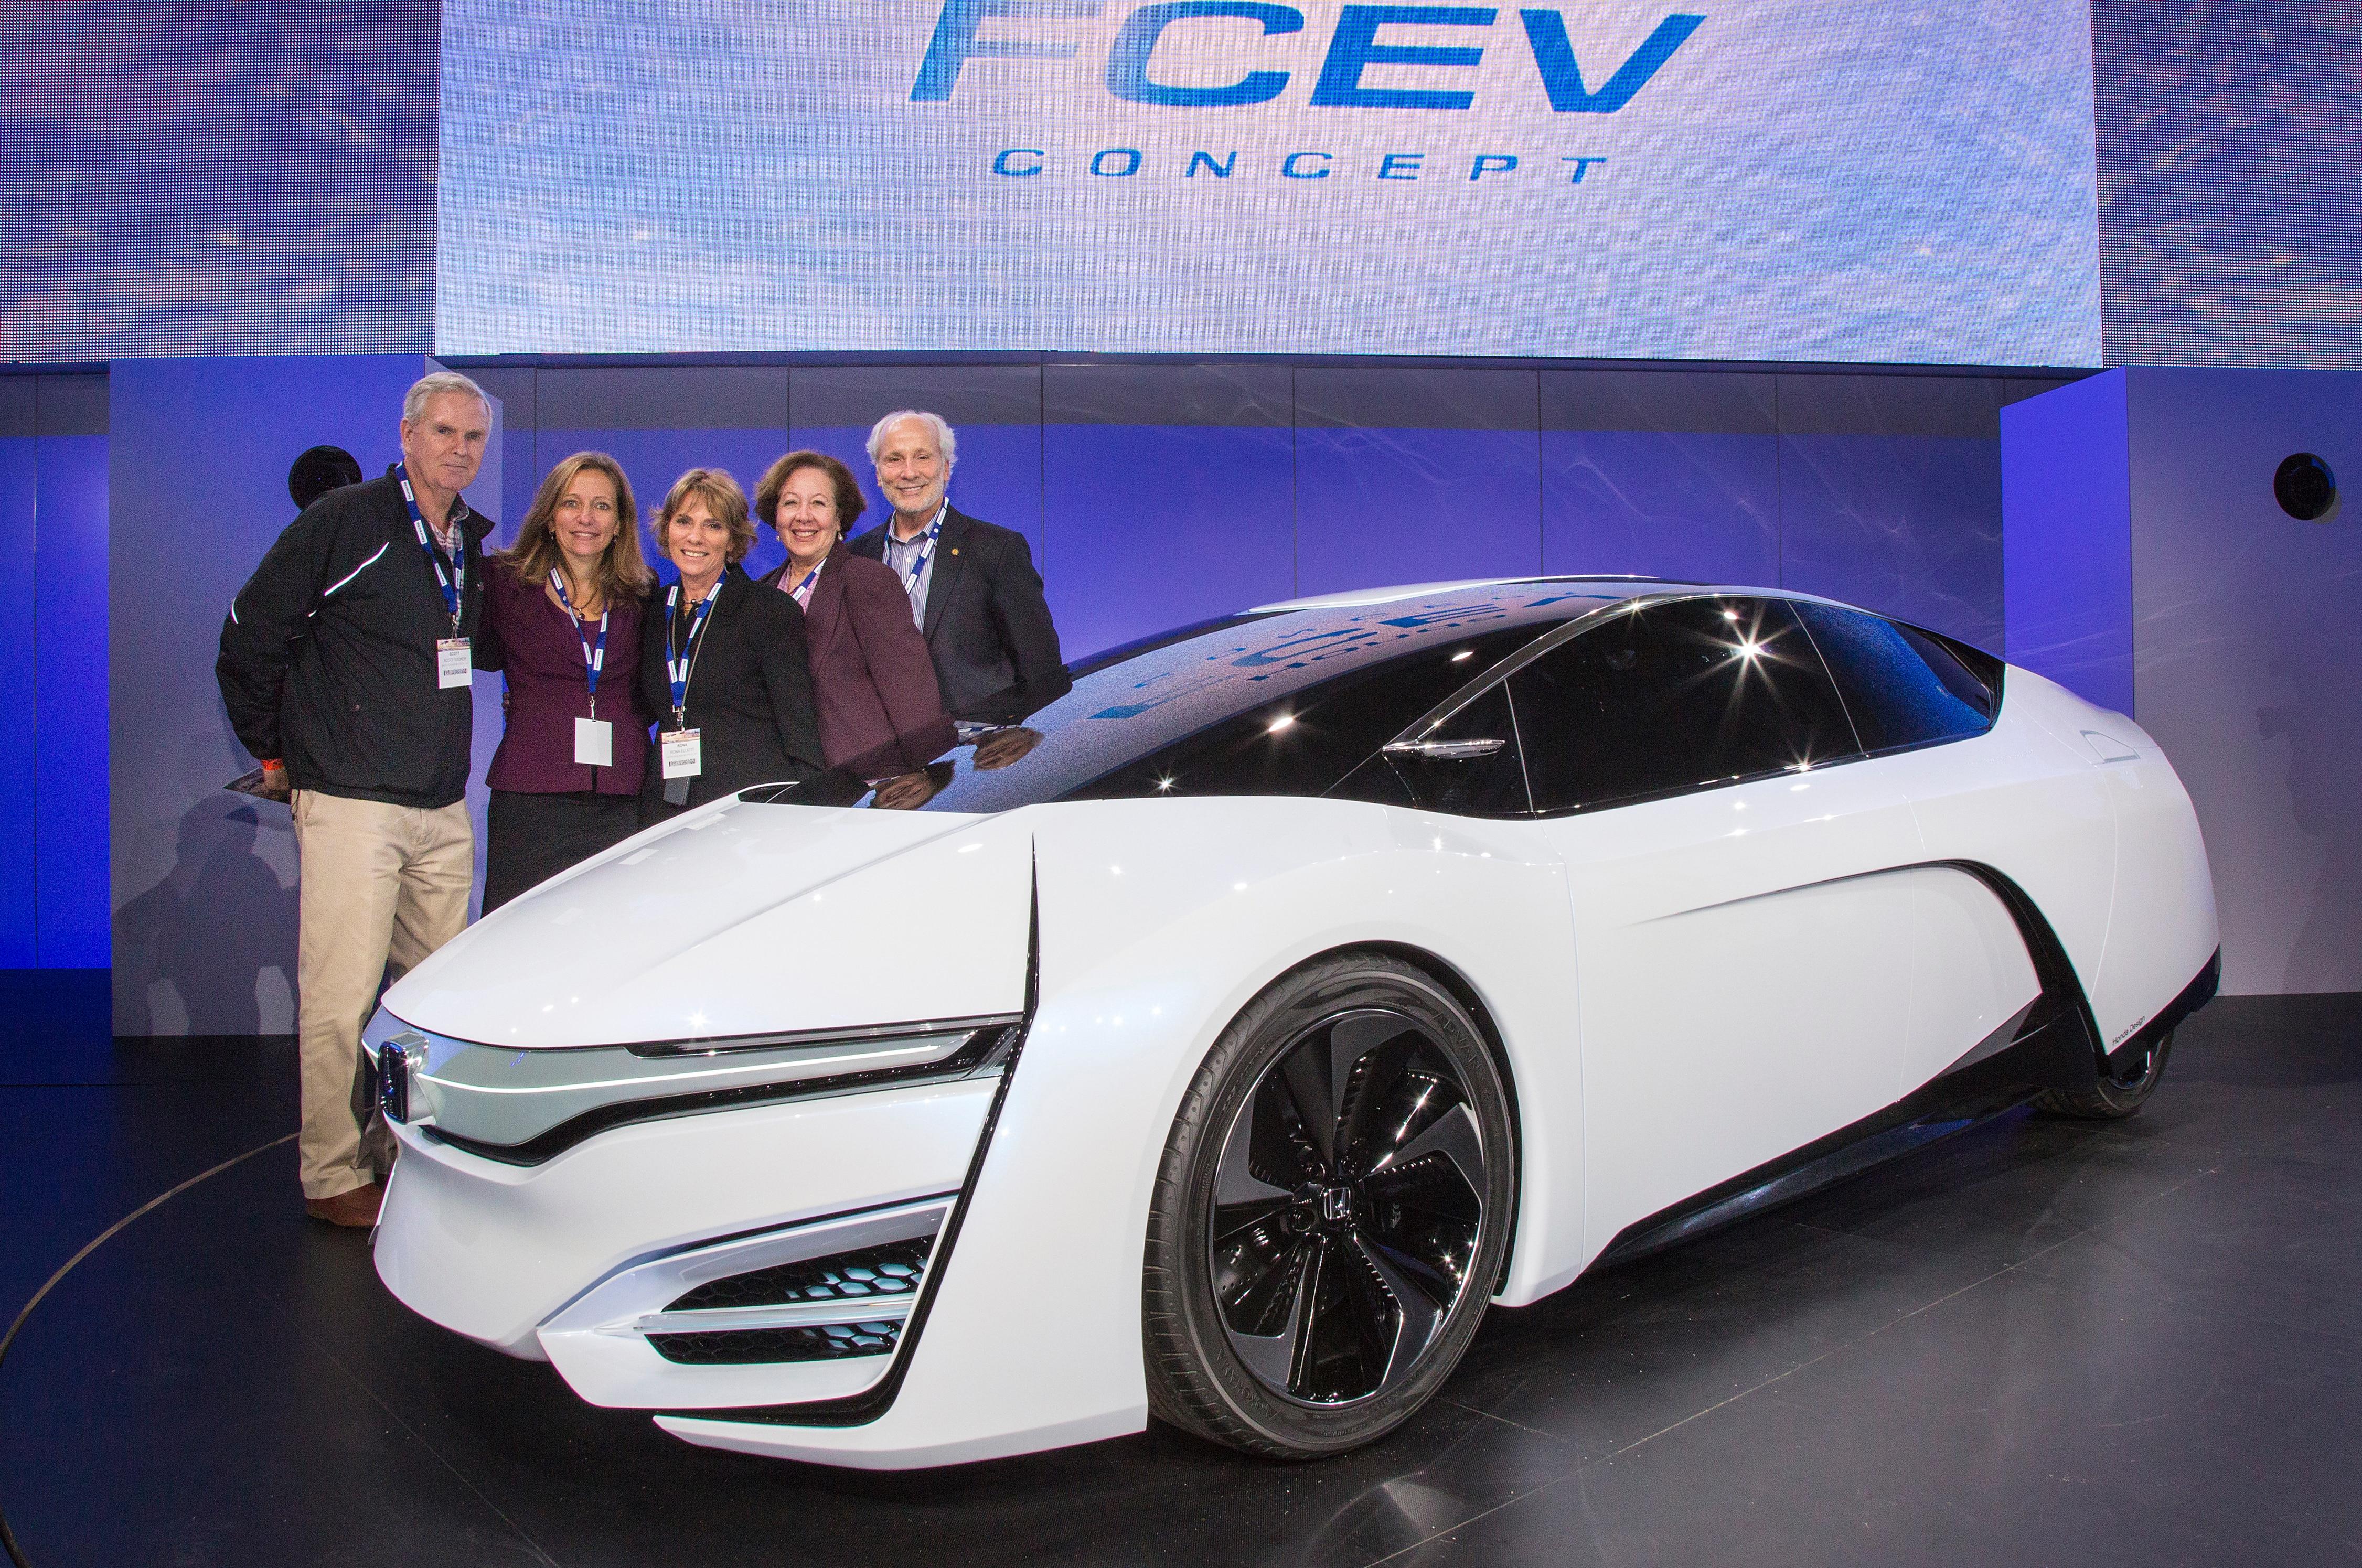 Honda Fcev Concept Debut 21